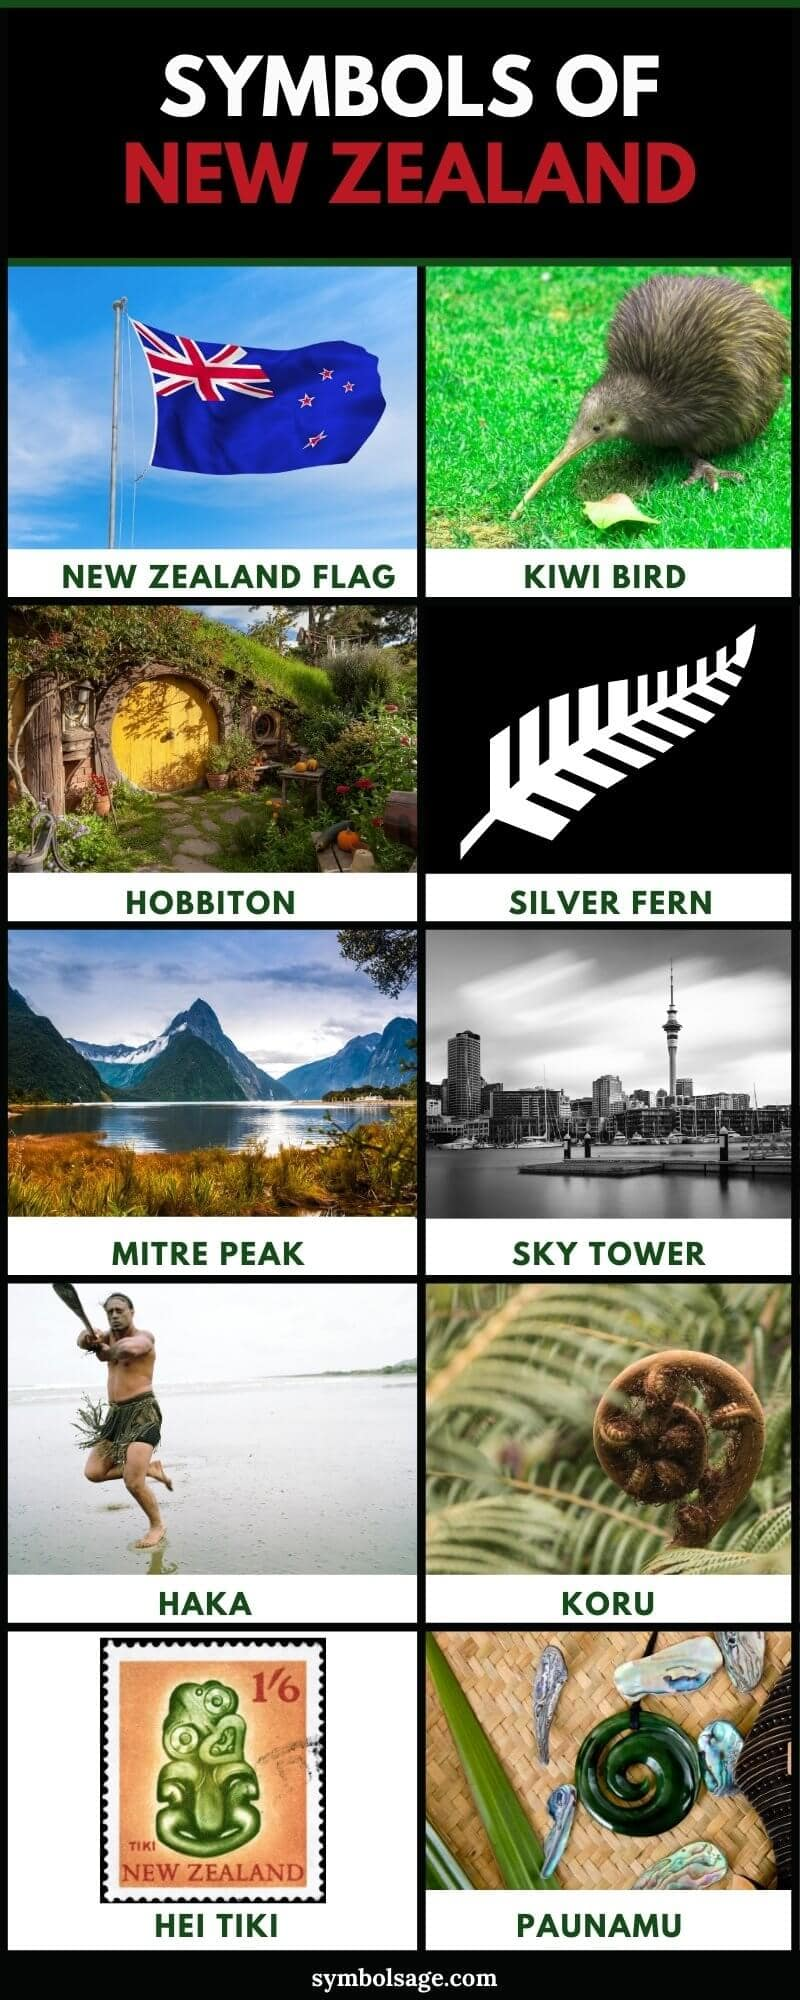 New Zealand symbols